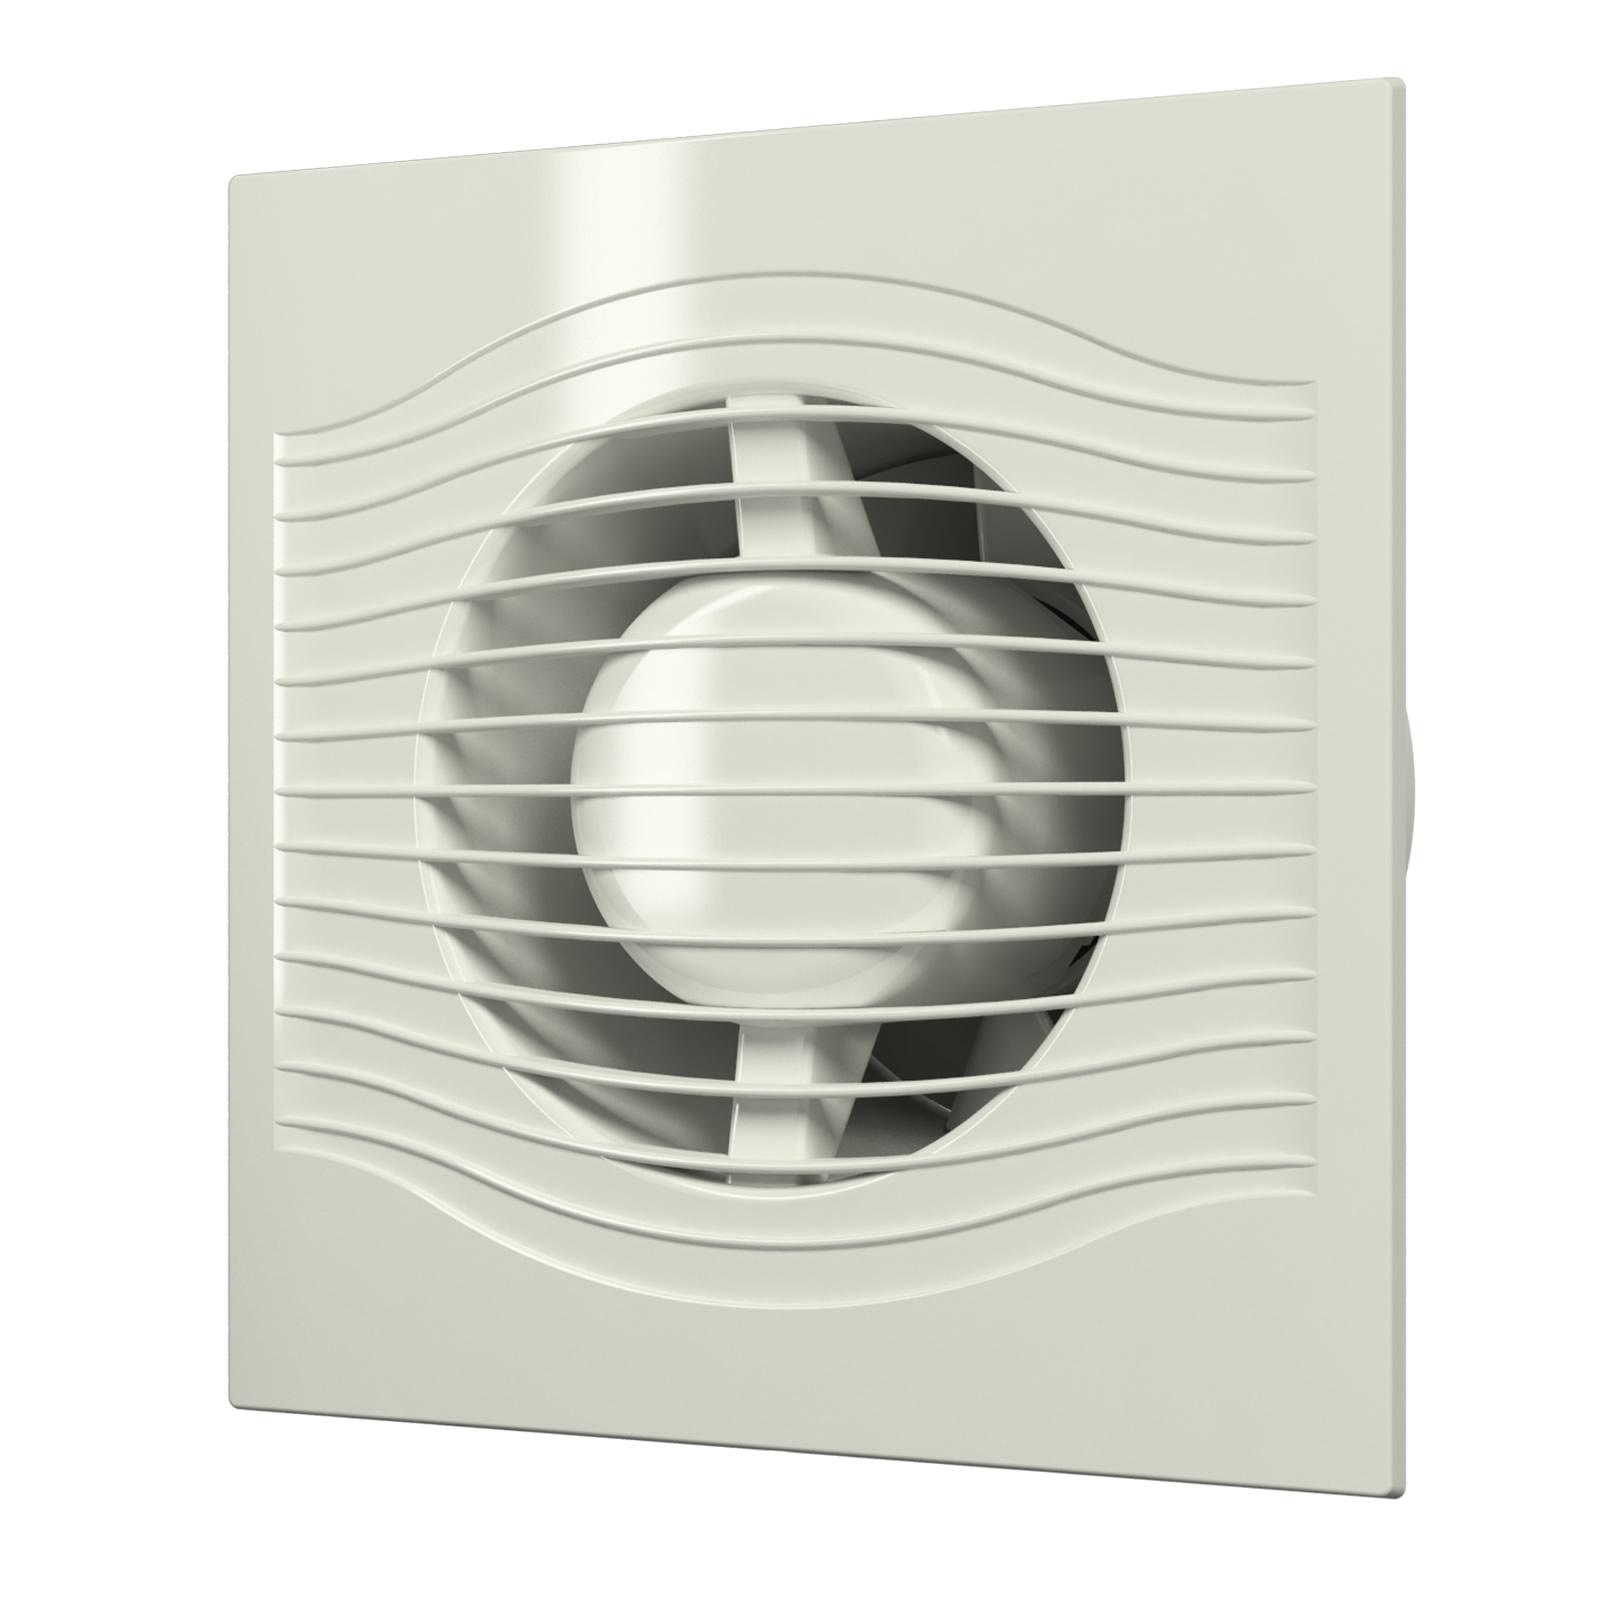 Вентилятор Diciti Slim 4 ivory